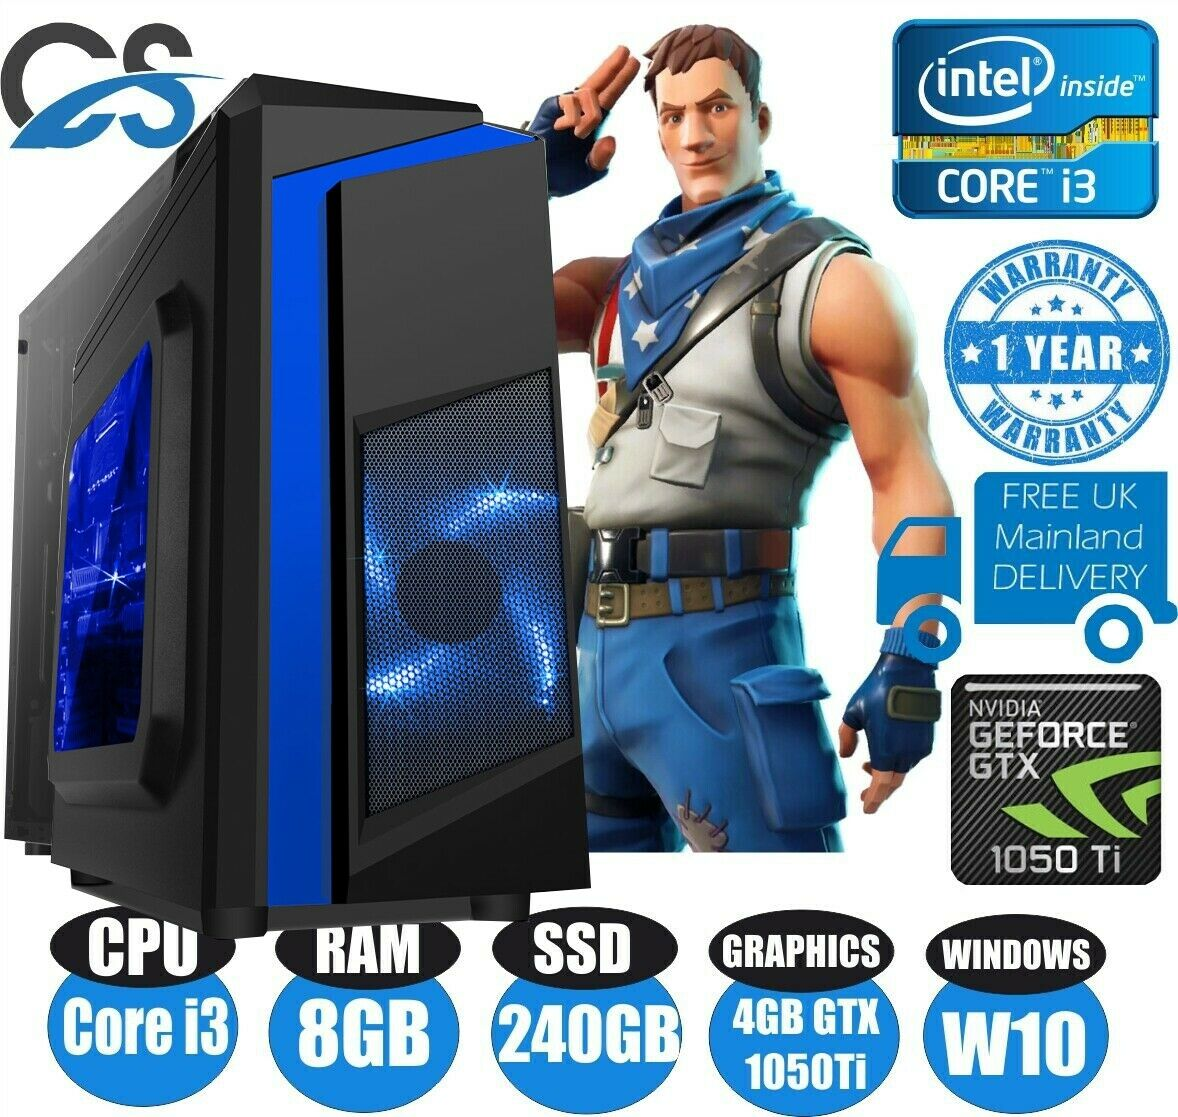 Computer Games - FAST Gaming Computer PC Bundle Intel Core i3 8GB 240GB SSD Win 10 4GB GTX1050 Ti